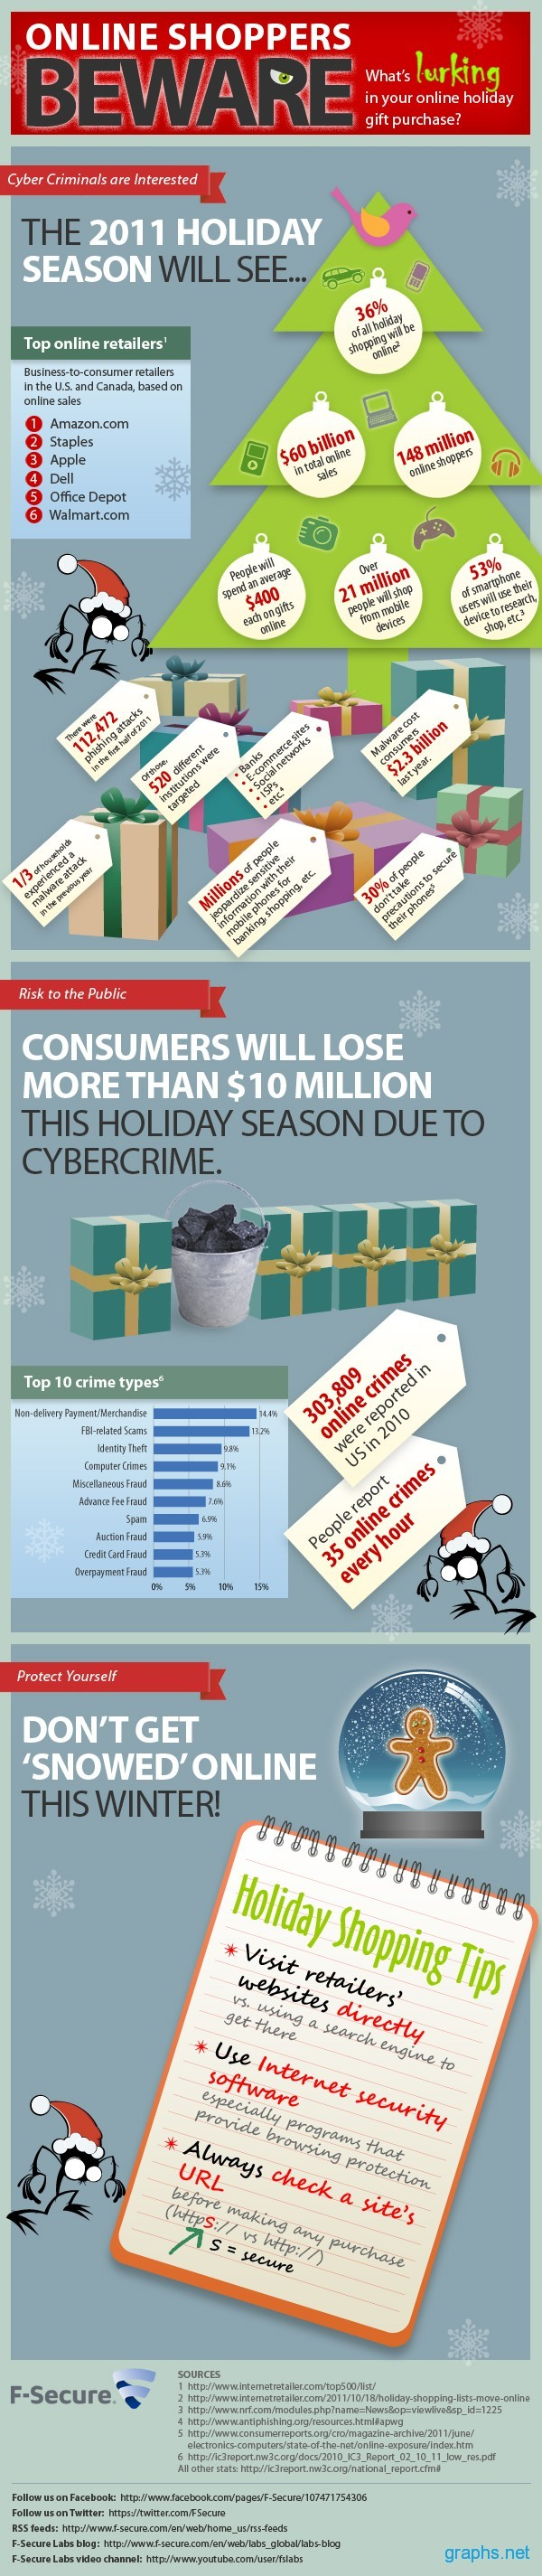 Beware When Shopping Online